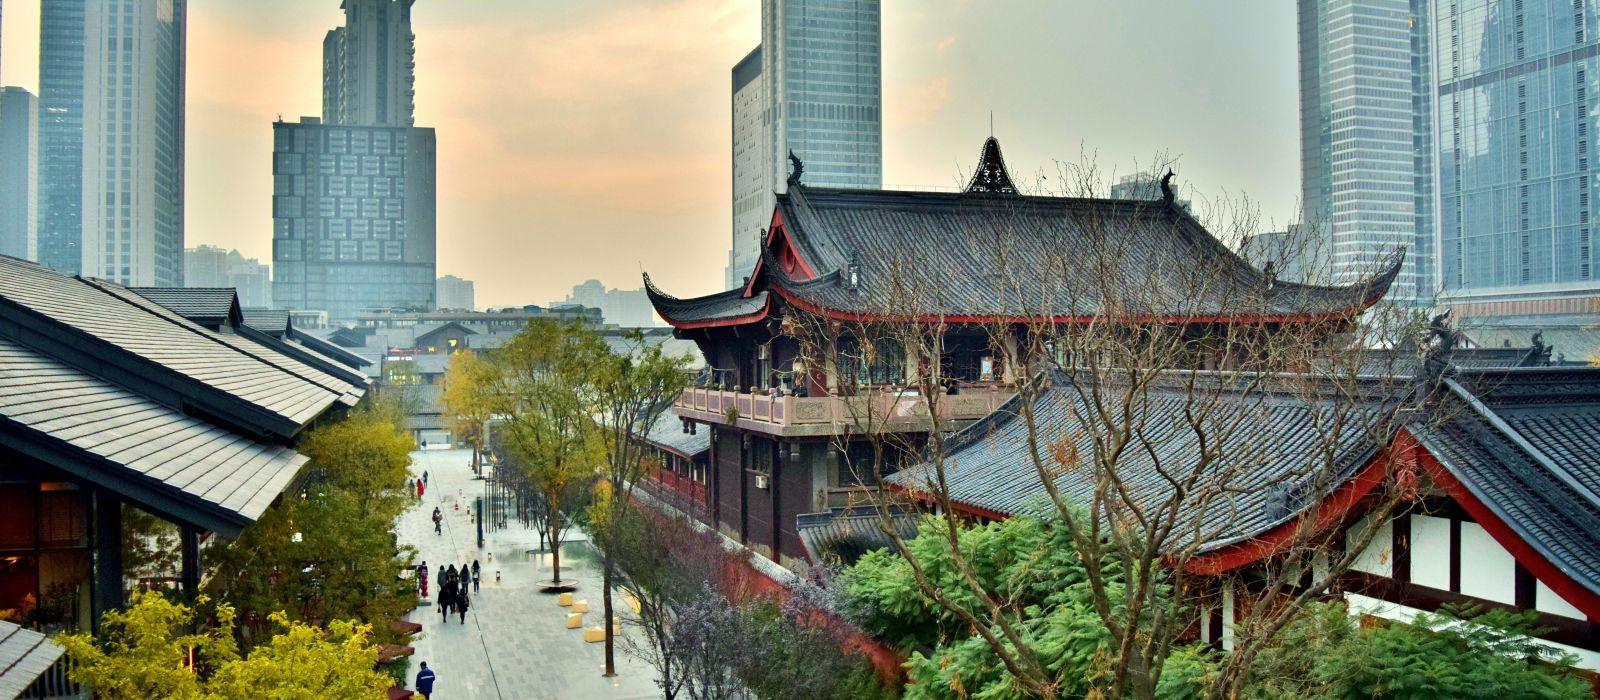 Destination Chengdu China